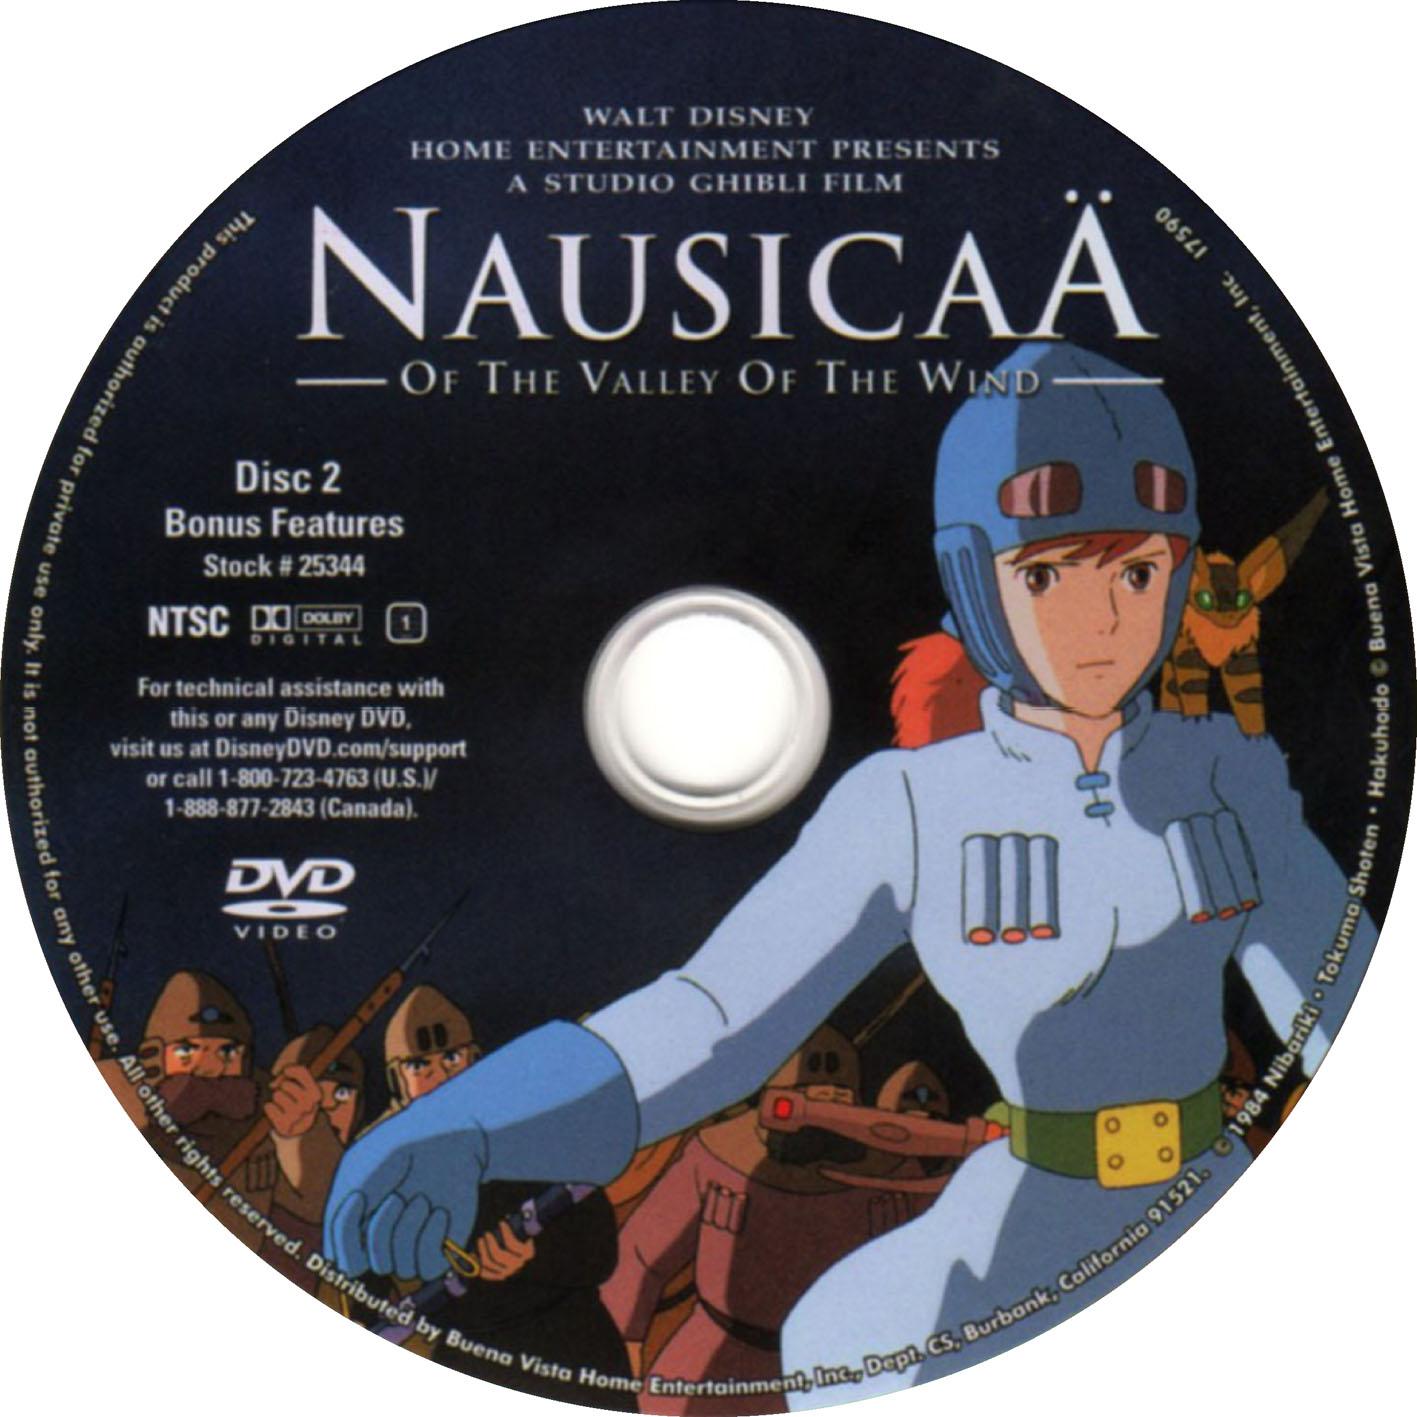 Amazon.com: Nausicaä of the Valley of the Wind: Alison Lohman ...